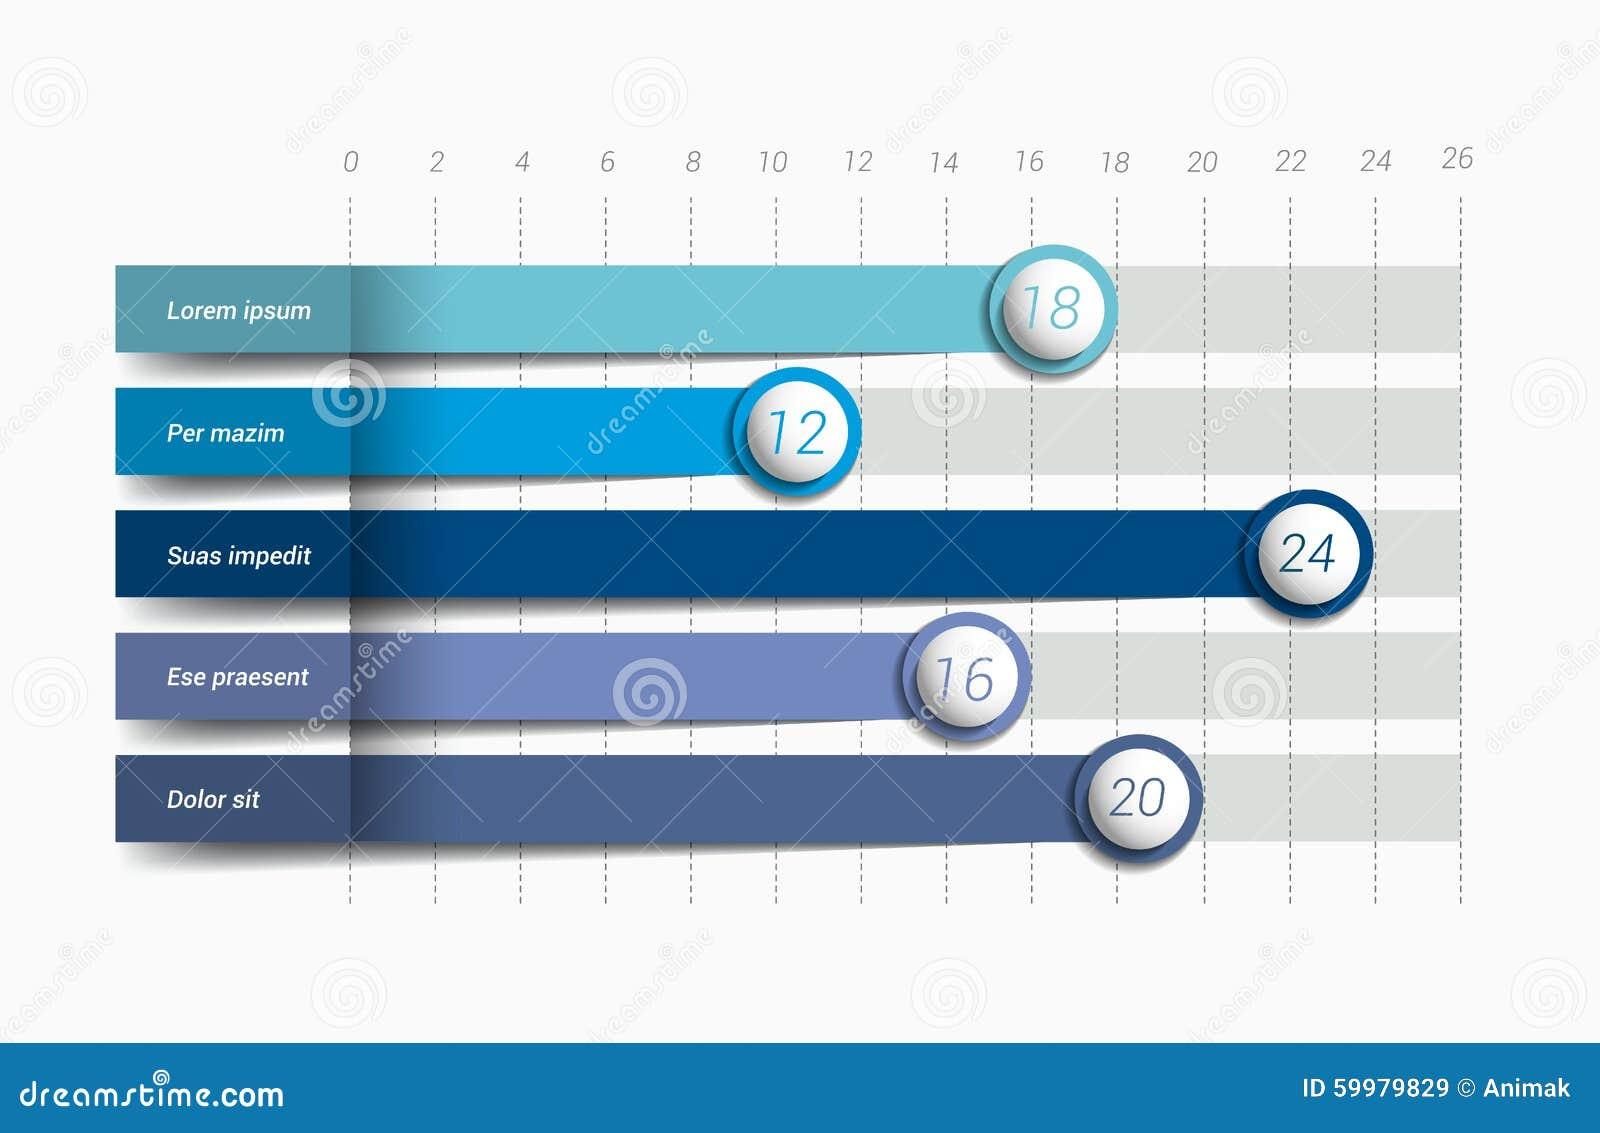 Flat chart, graph. Simply blue color editable.